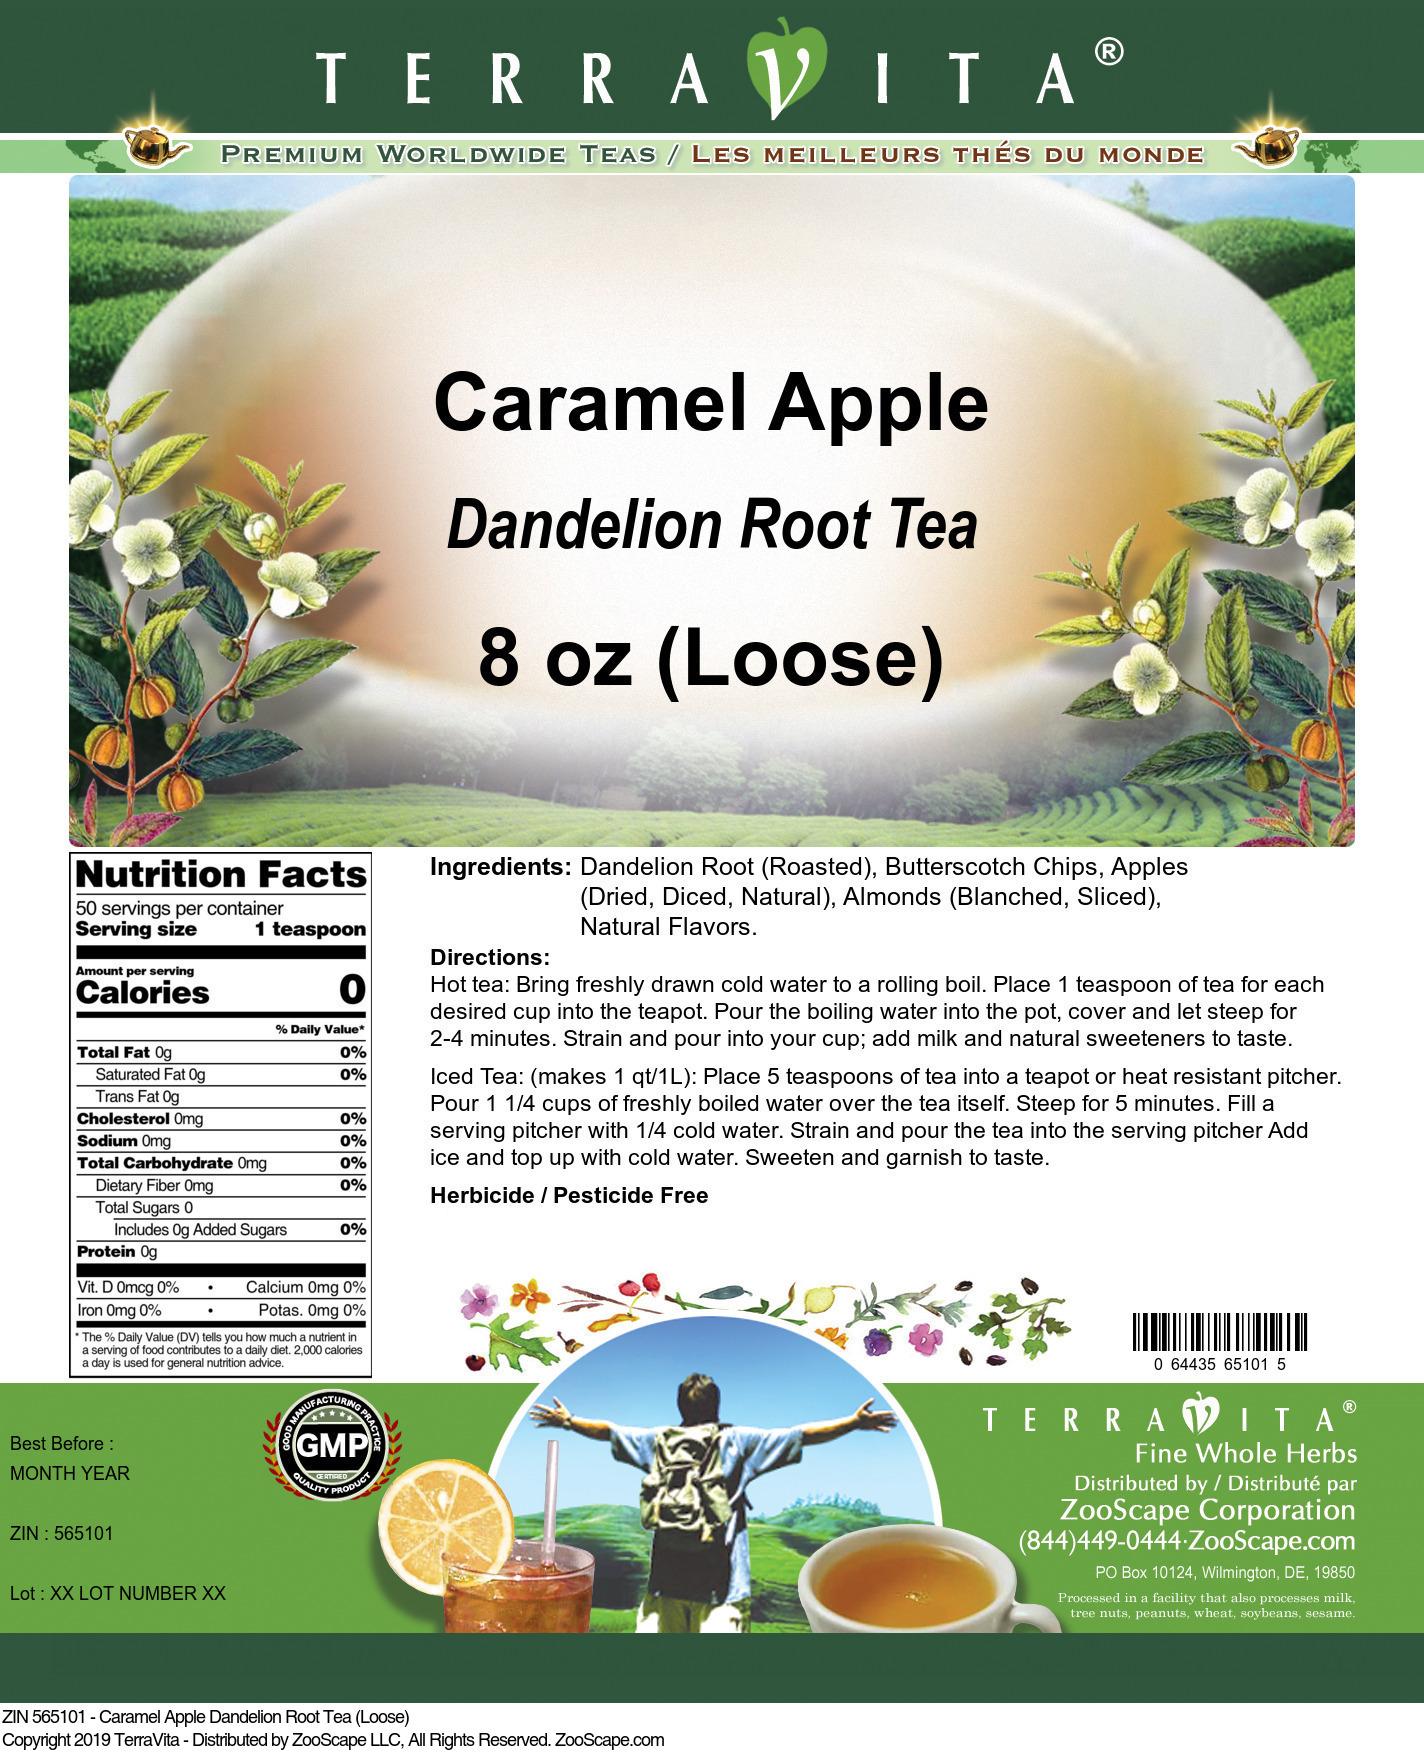 Caramel Apple Dandelion Root Tea (Loose)